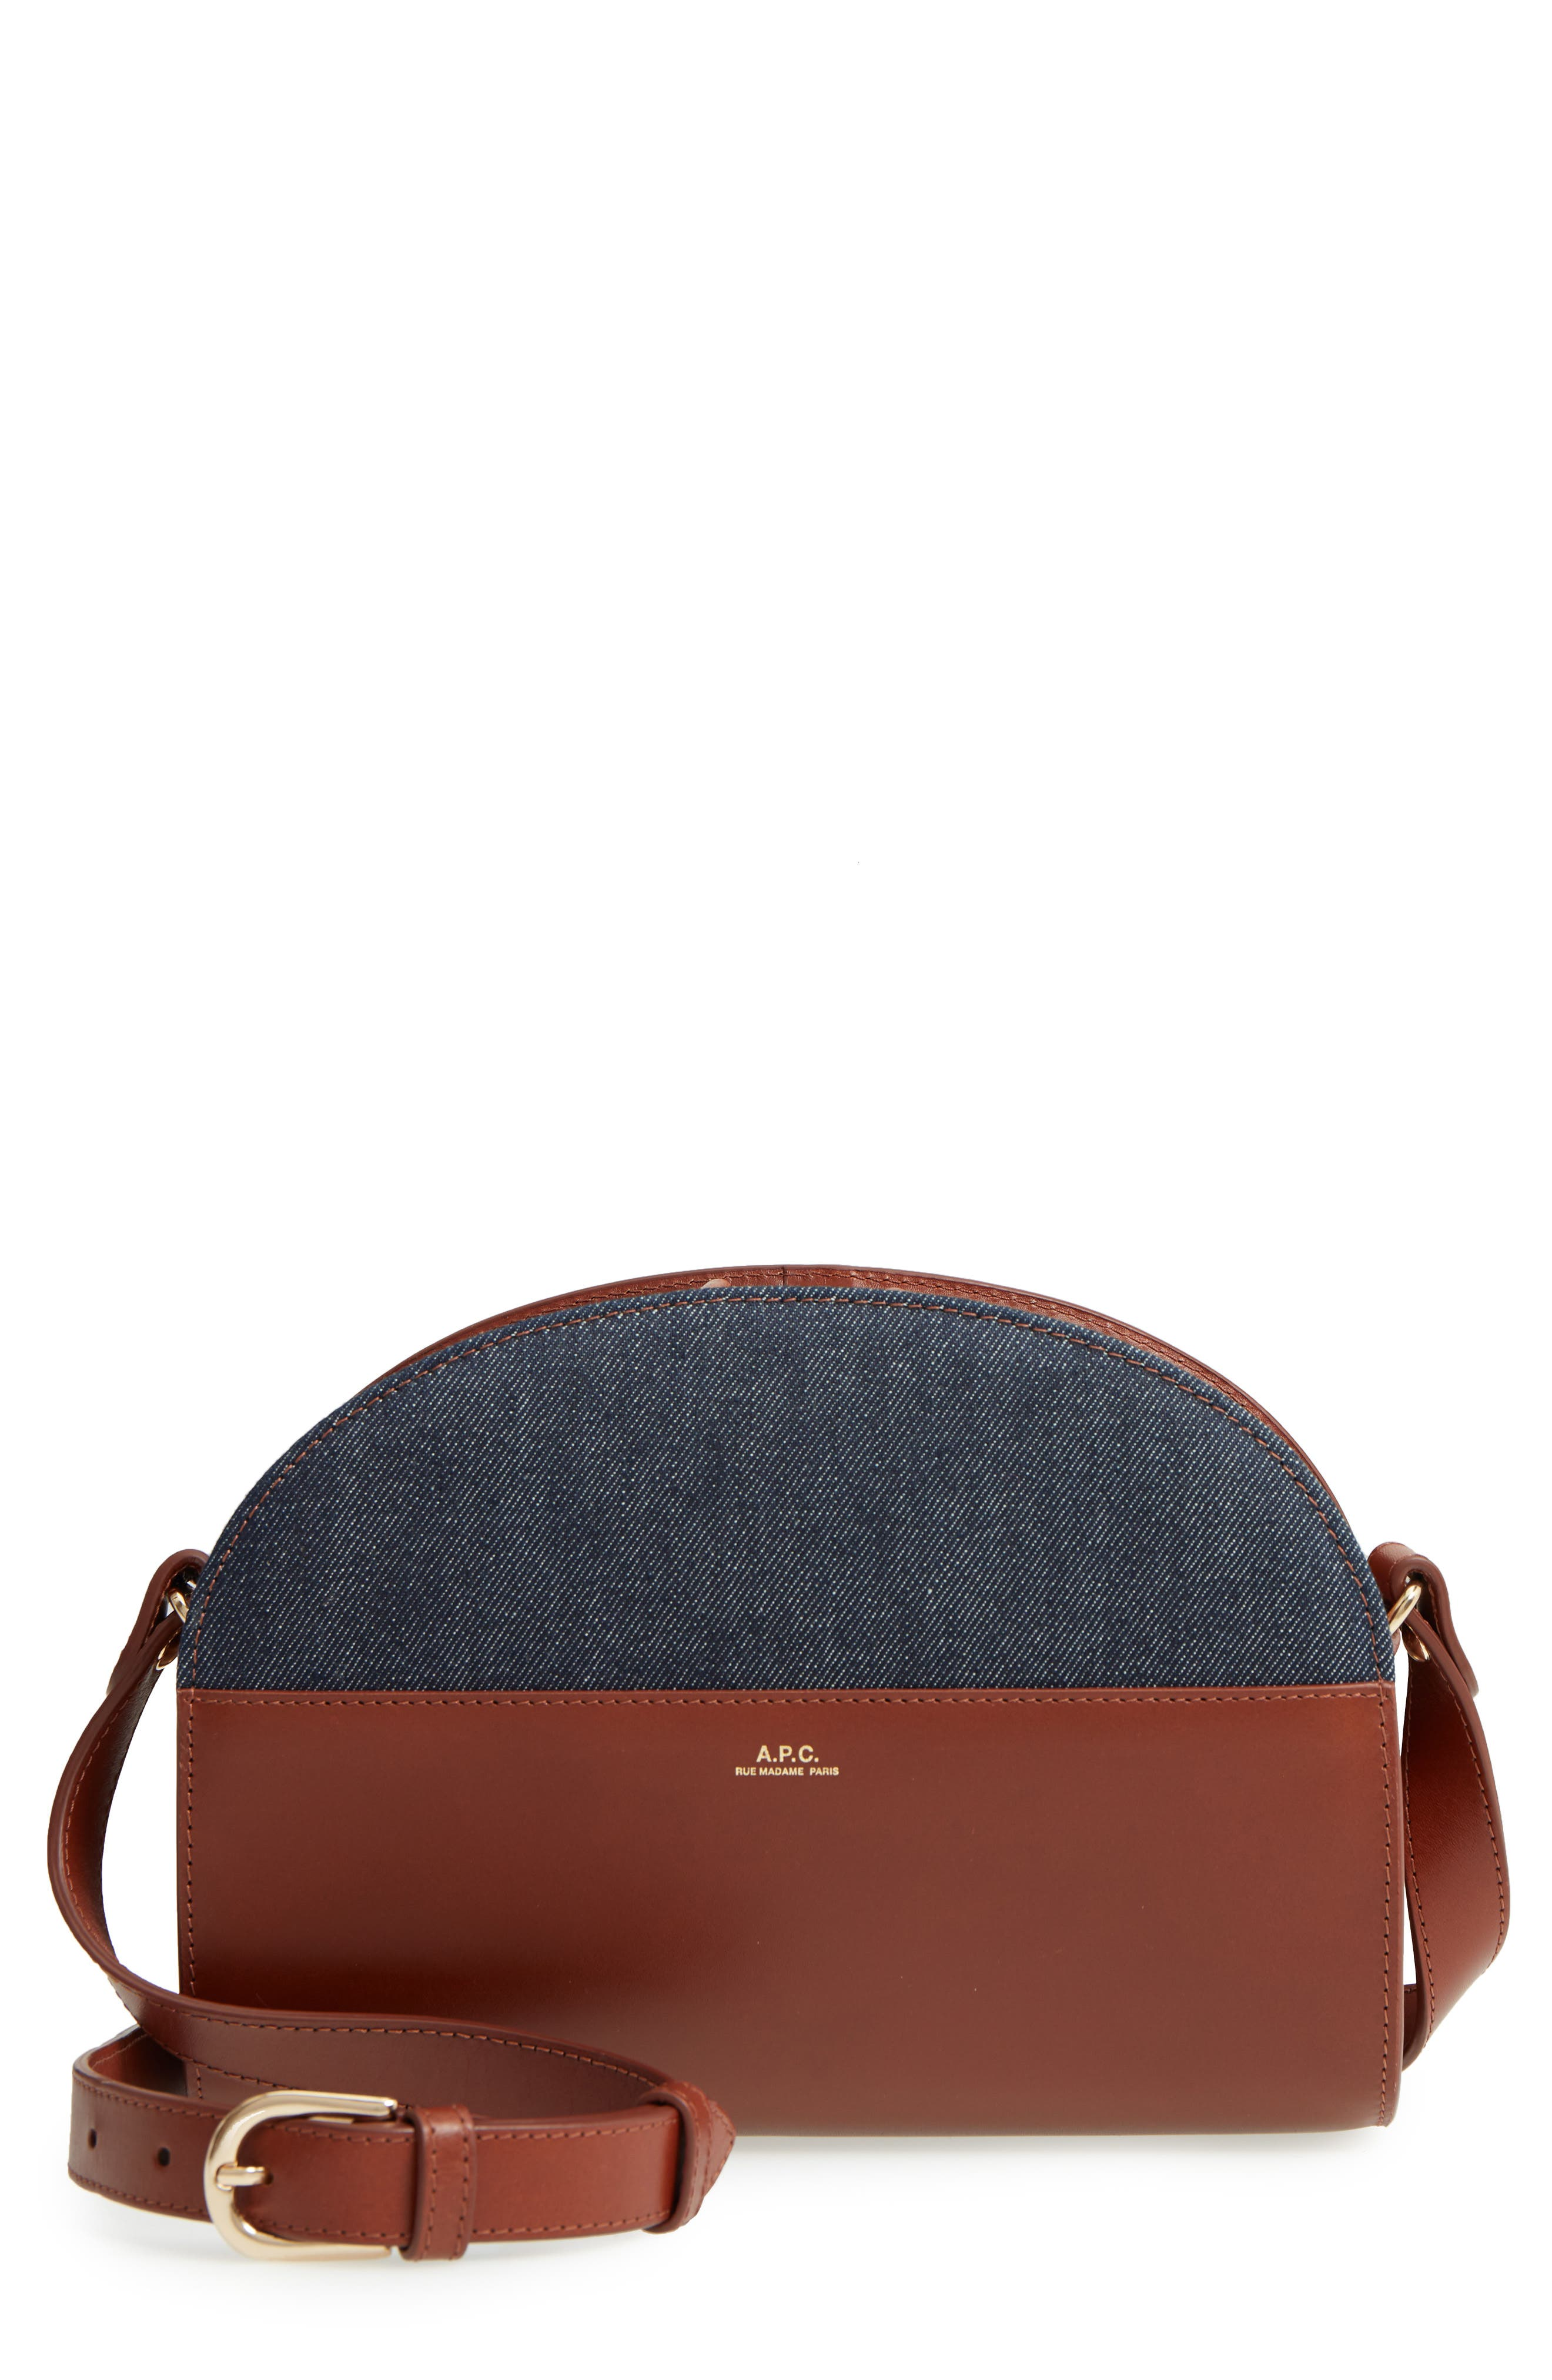 A.P.C., Sac Demilune Leather & Denim Crossbody Bag, Main thumbnail 1, color, 242